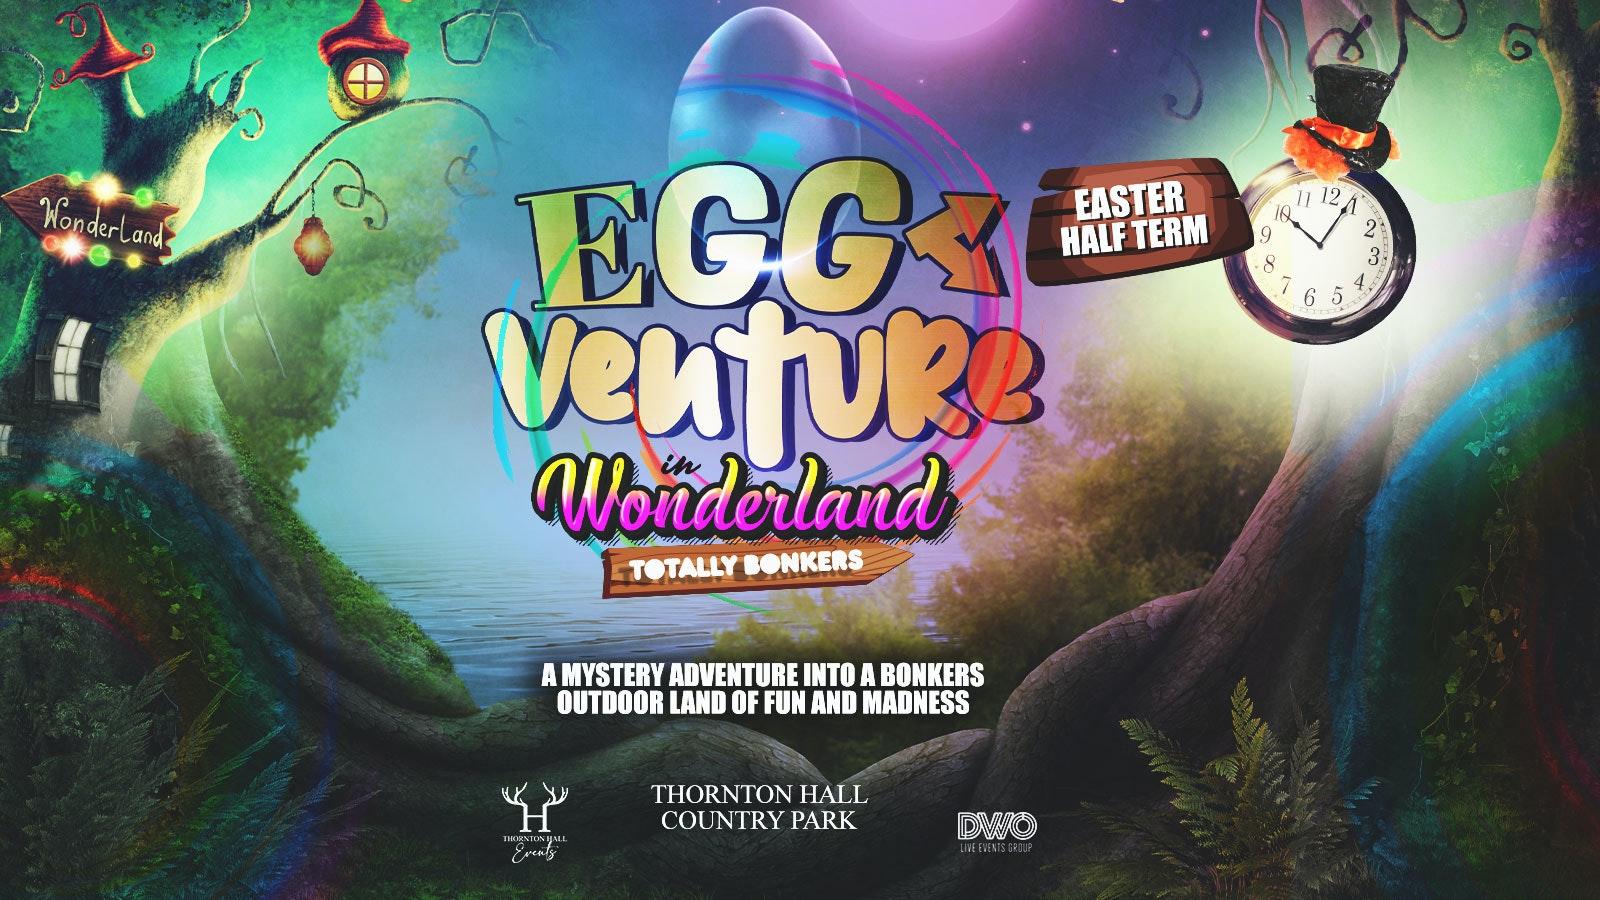 EggVenture in Wonderland – Sunday 11th April – 1pm